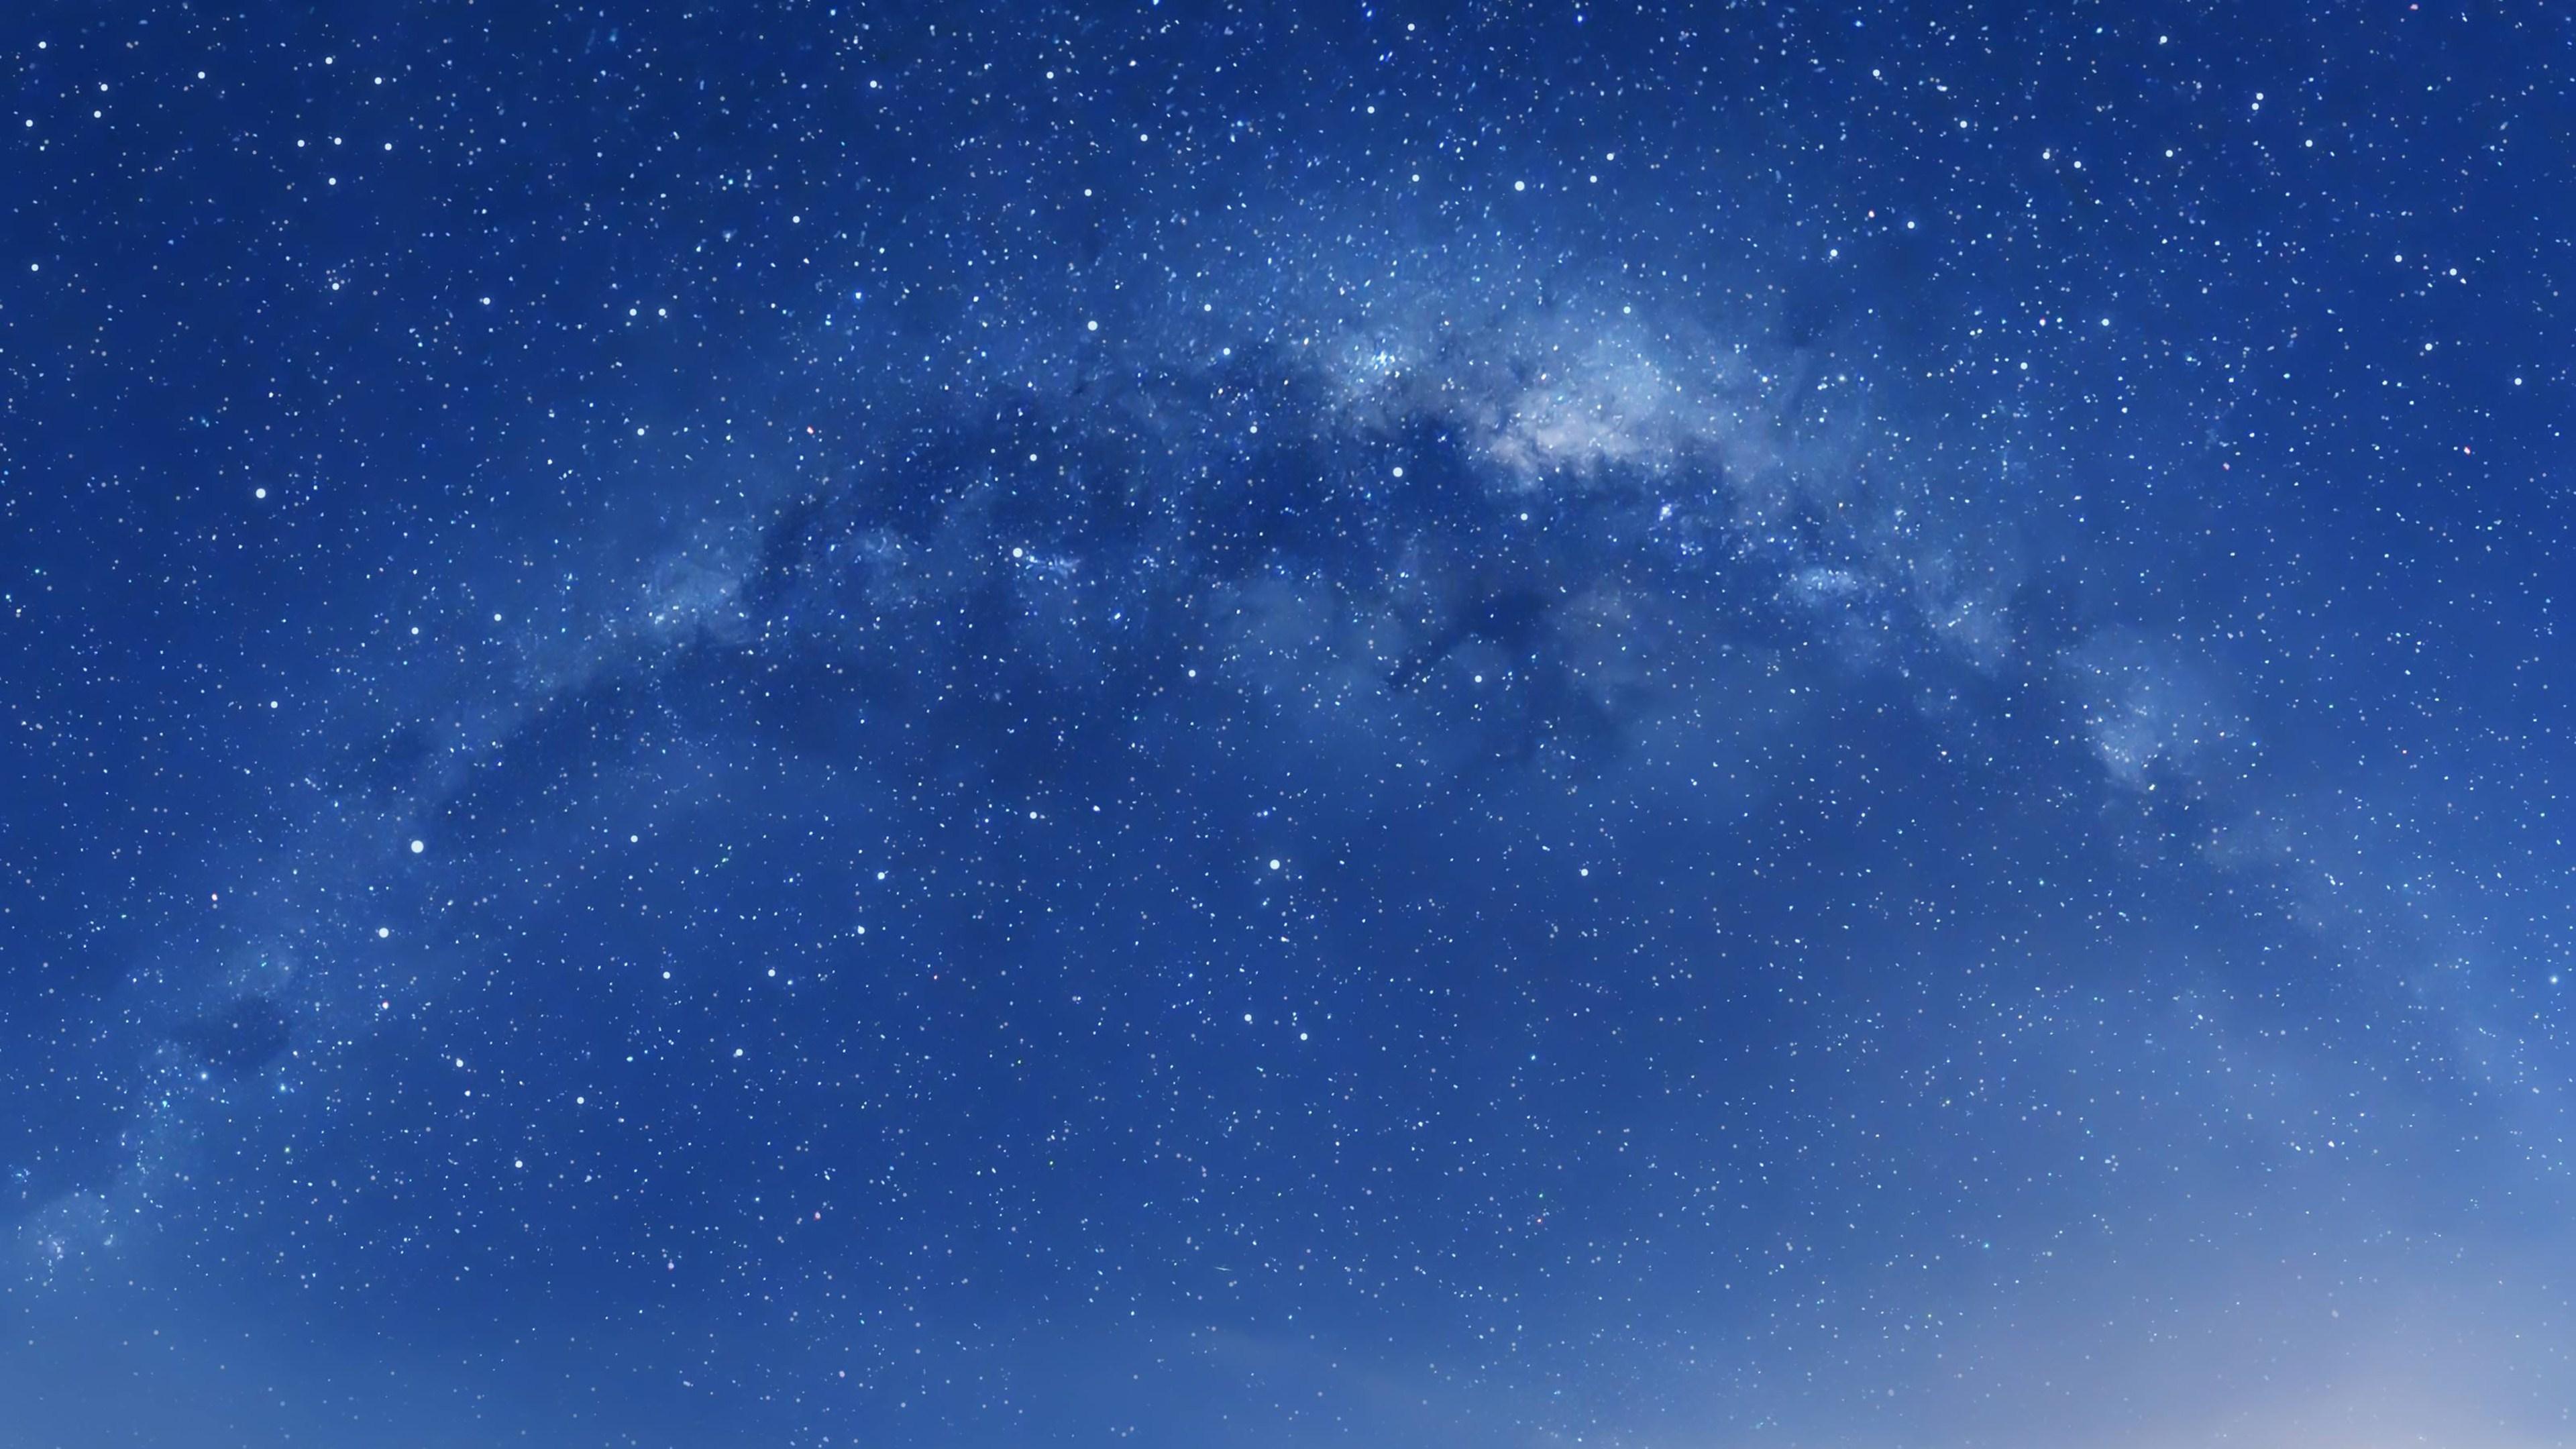 Galaxy 4k ultra hd wallpaper background image - Blue space galaxy wallpaper ...